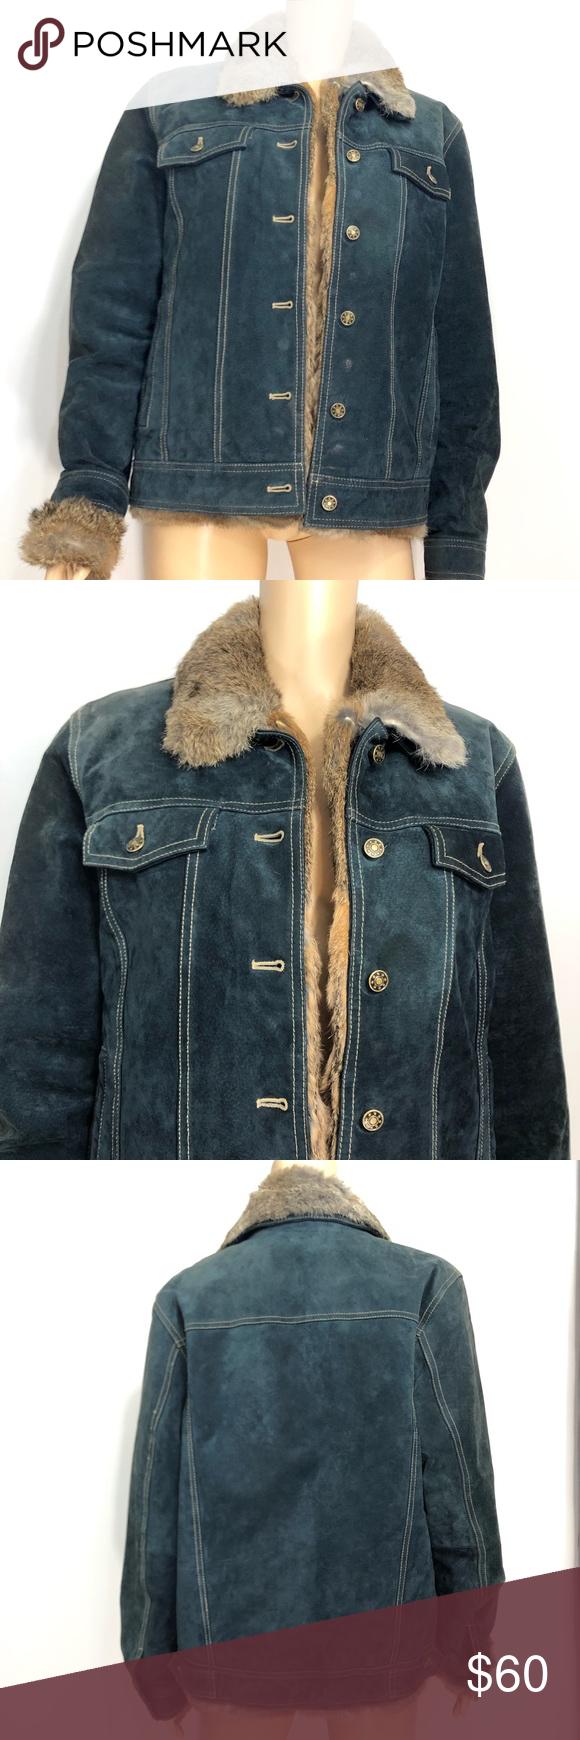 Blue Suede Coat W/Removable Fur Collar Large Blue suede